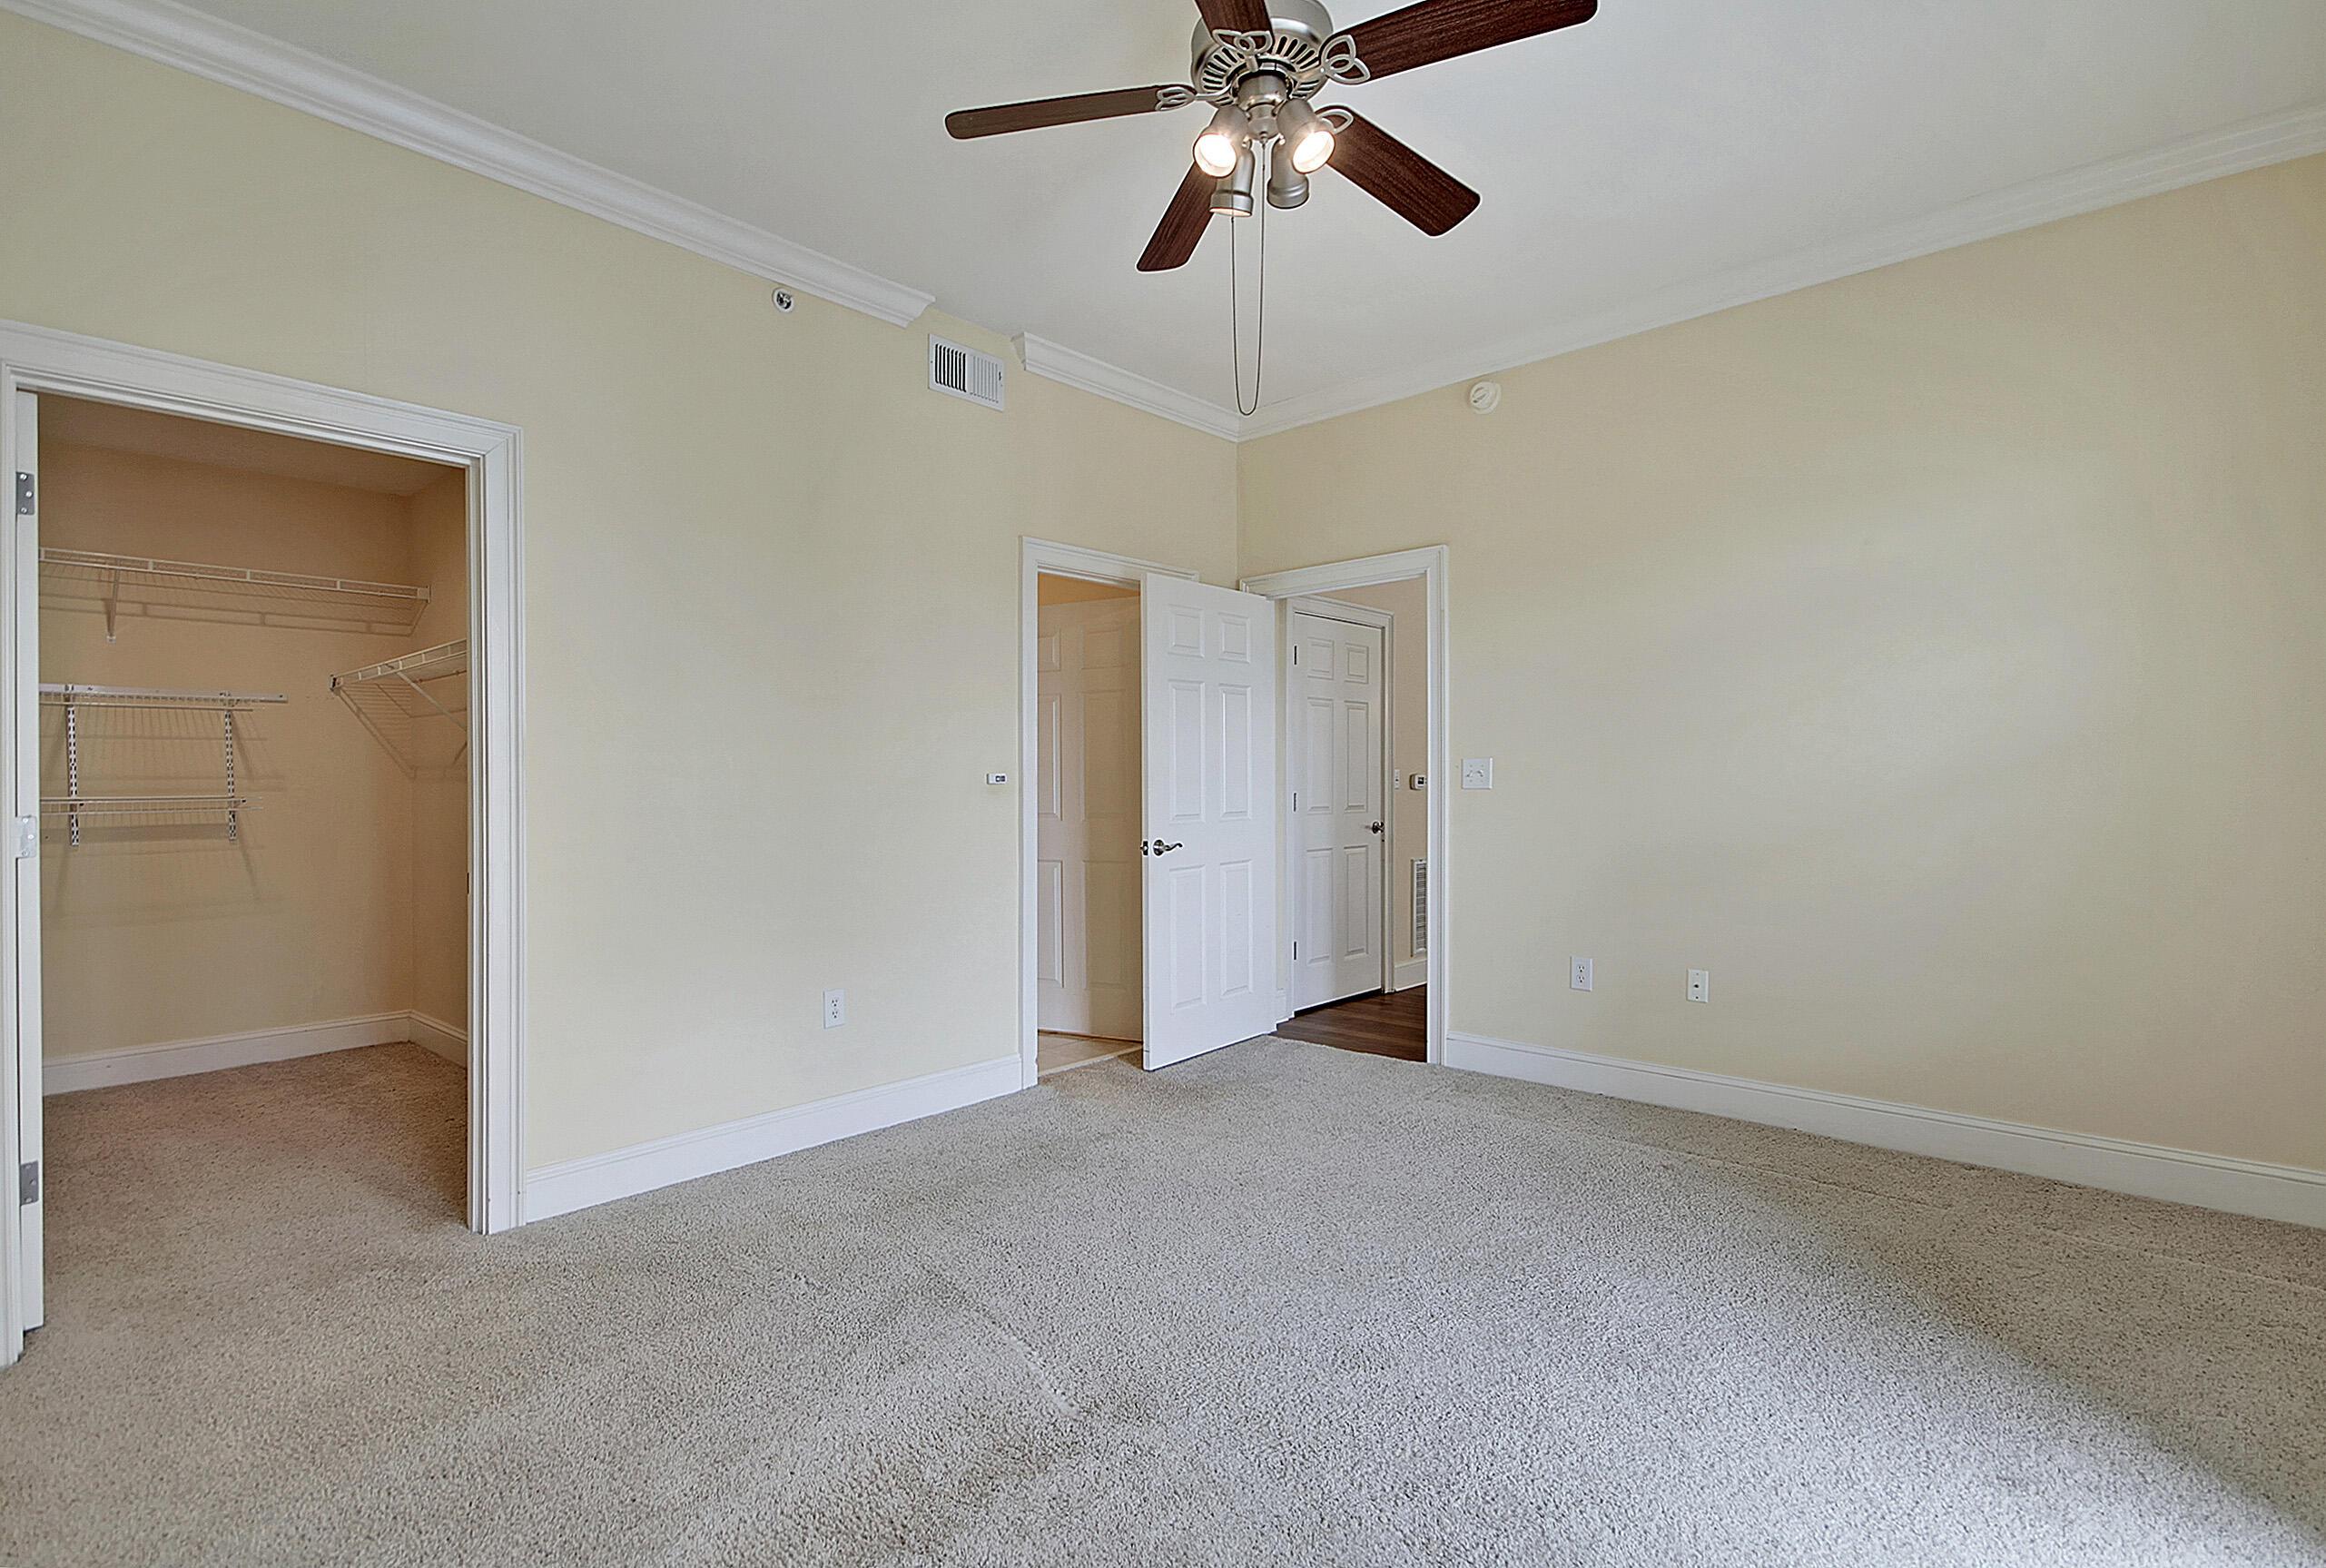 Albemarle Homes For Sale - 498 Albemarle, Charleston, SC - 33